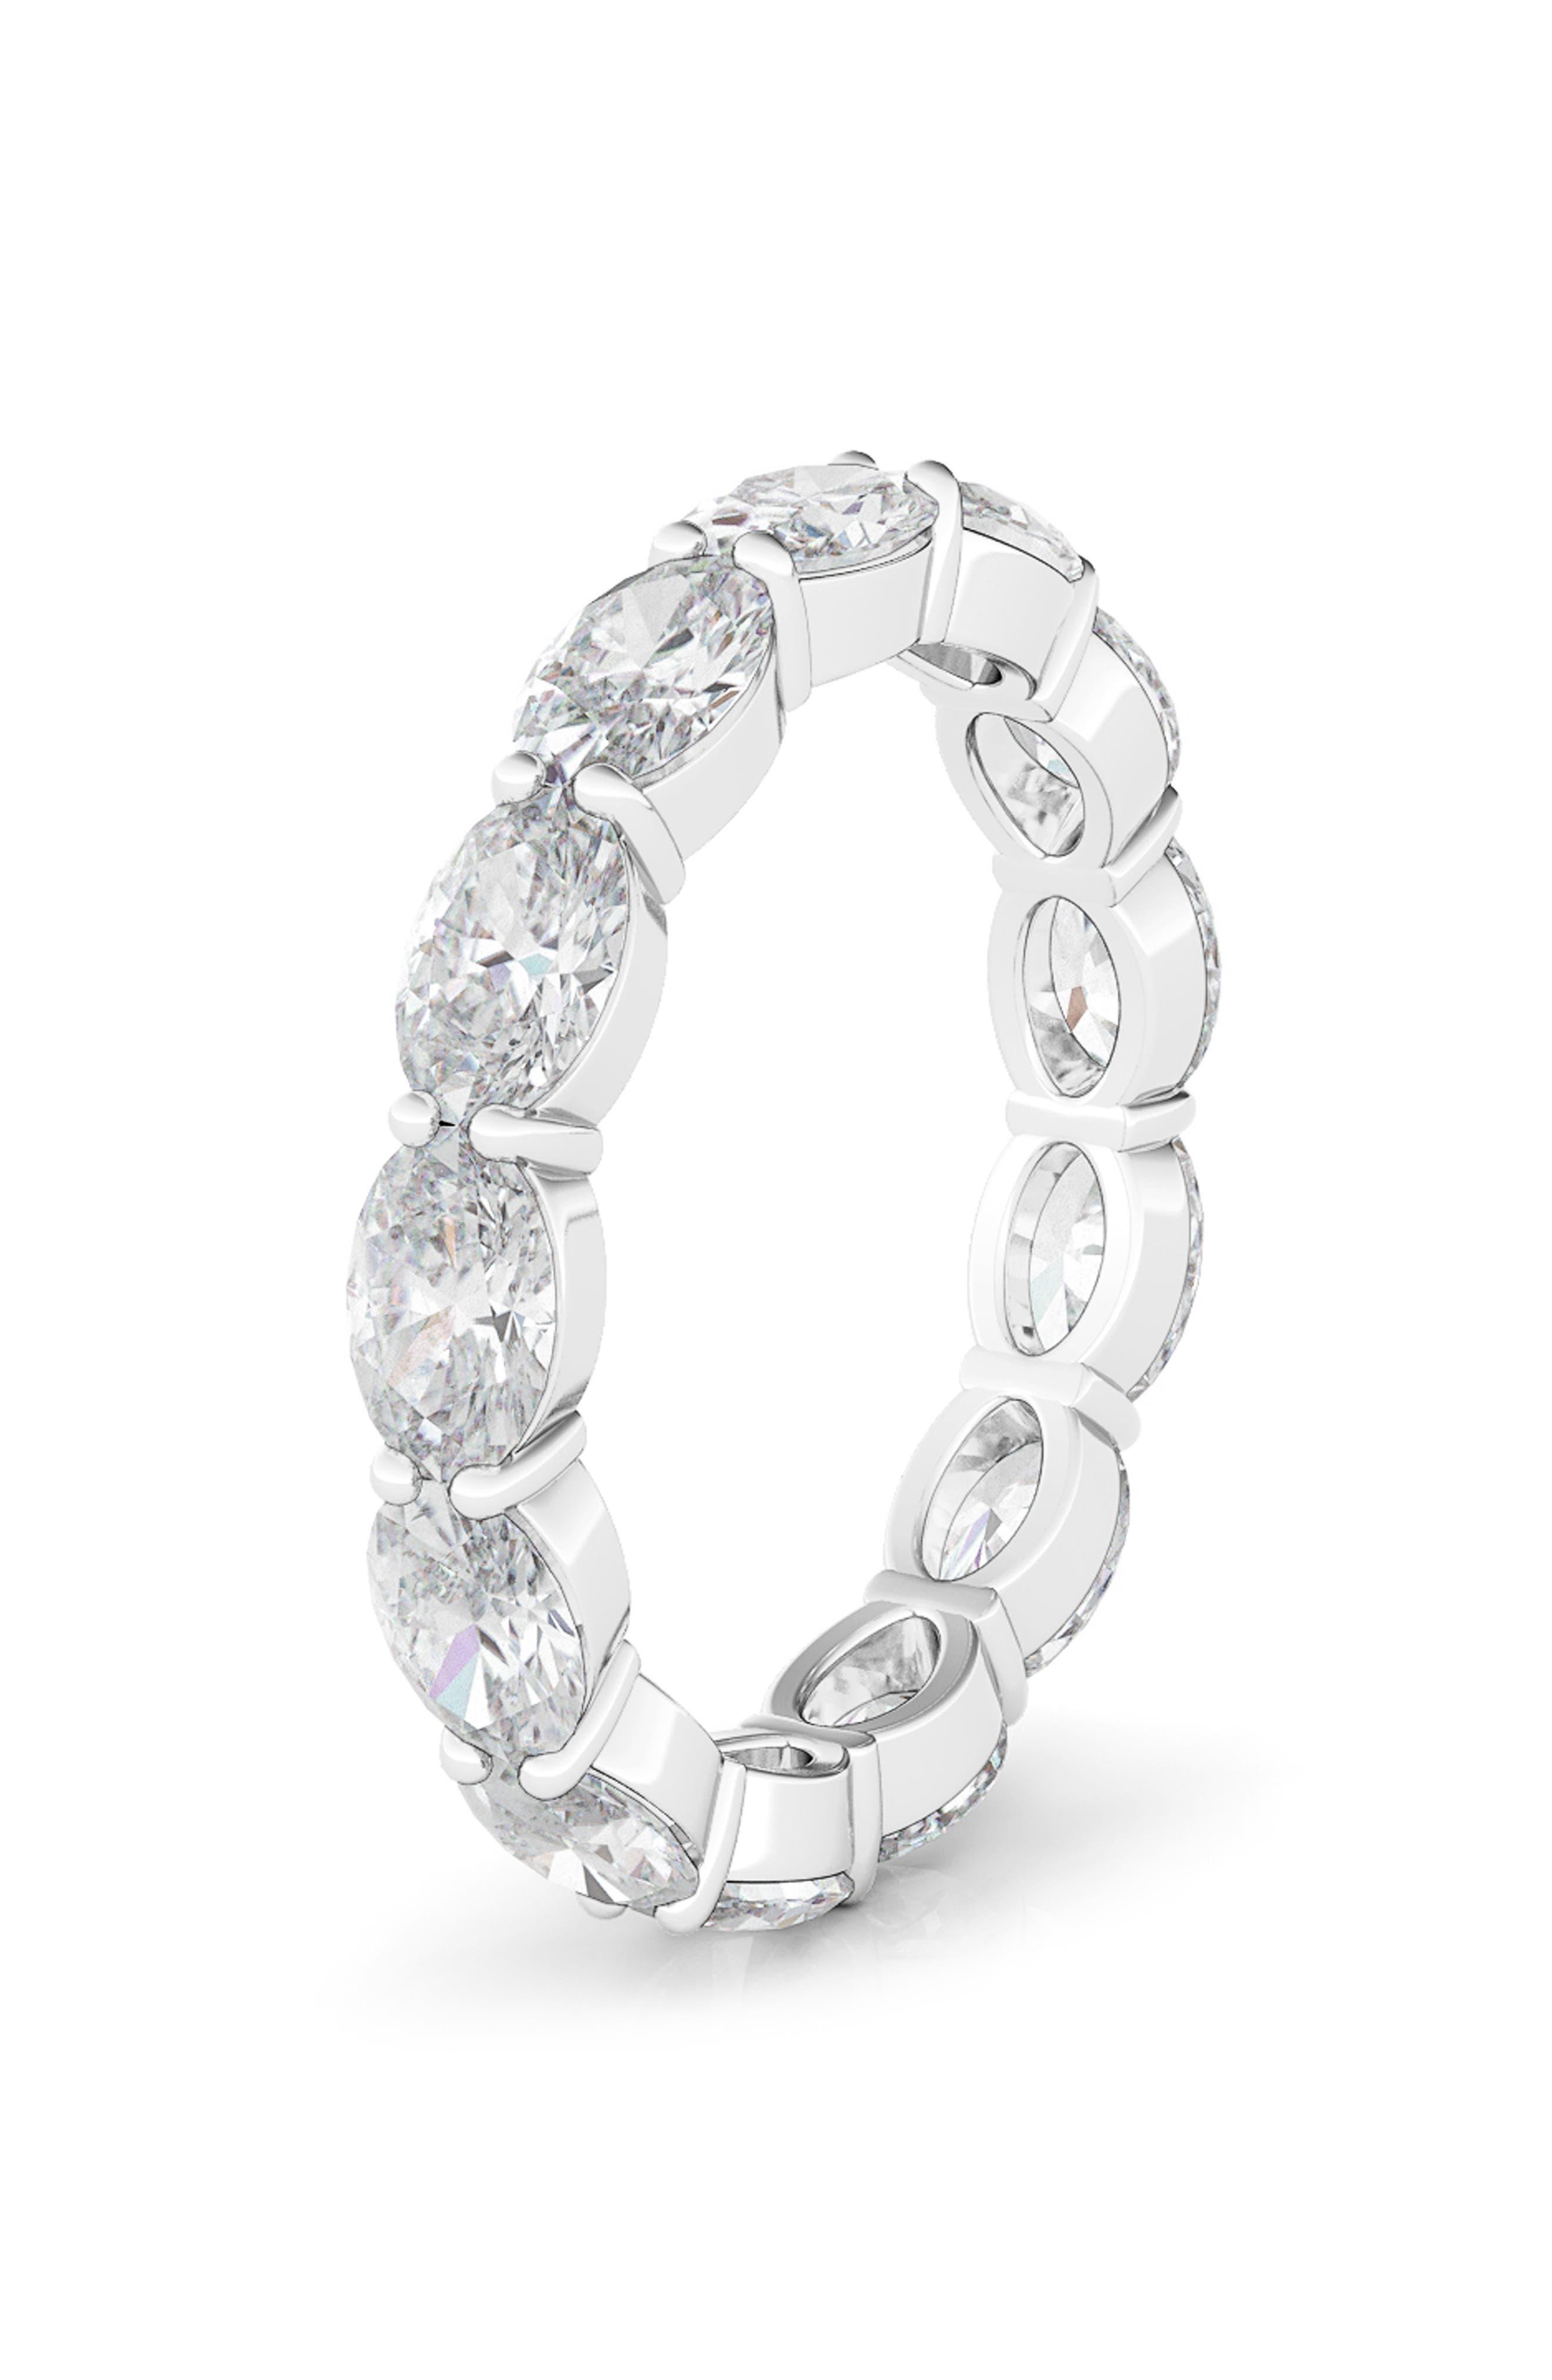 Sideways Oval Cut Diamond 14K Gold Eternity Ring